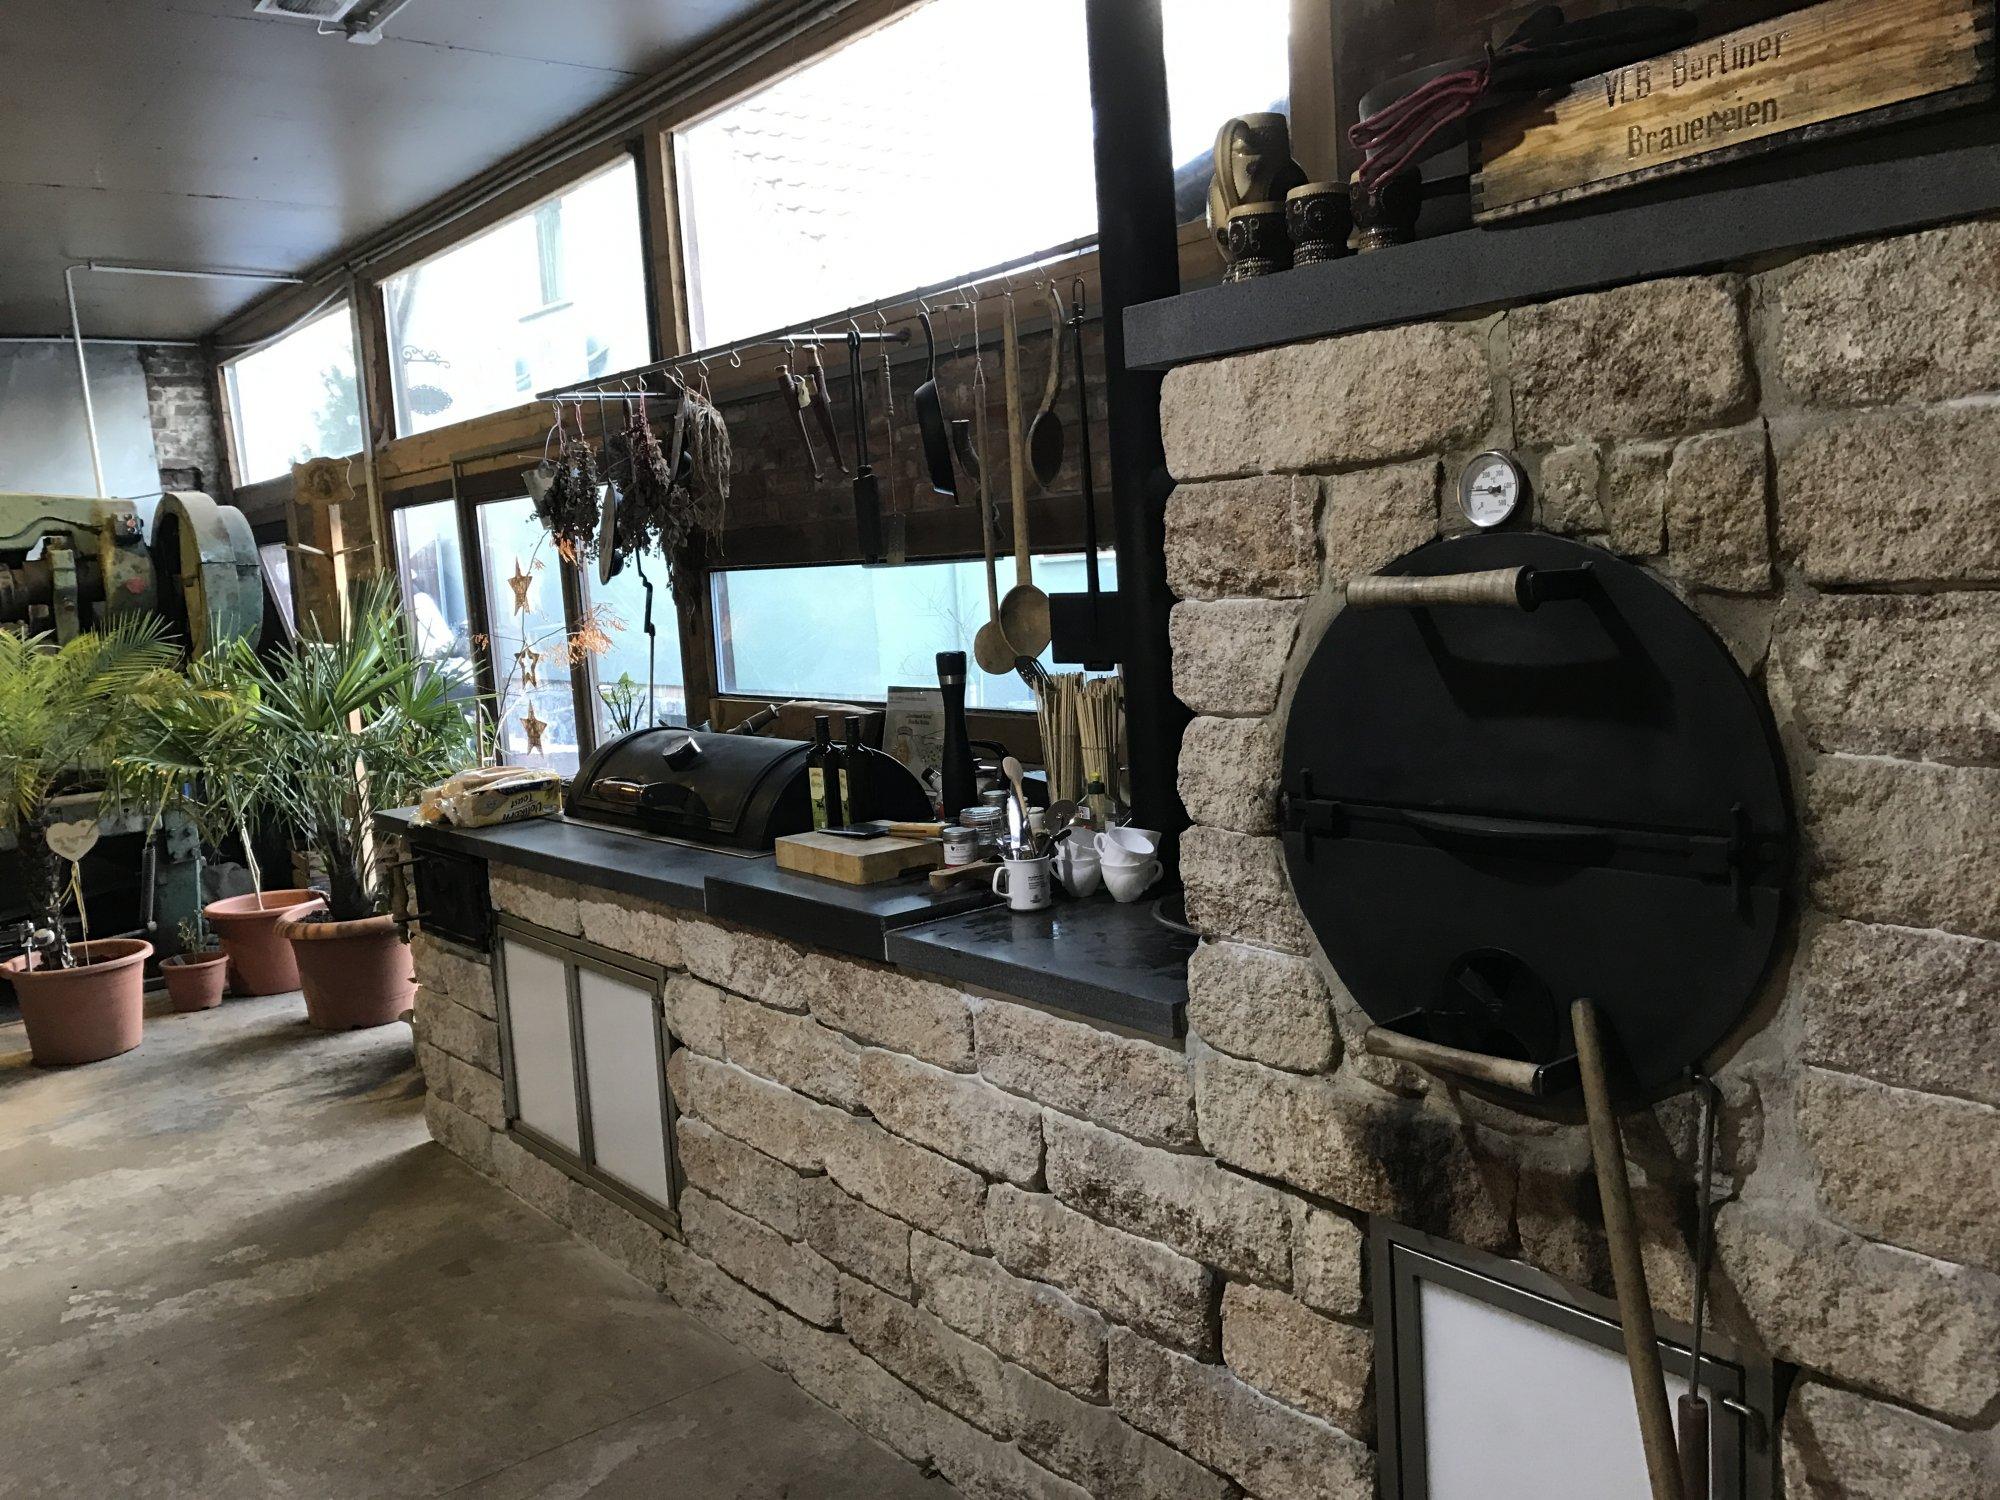 Outdoorküche Stein Xl : Outdoorküche stein xl die outdoorküche outdoor küche aussenküche